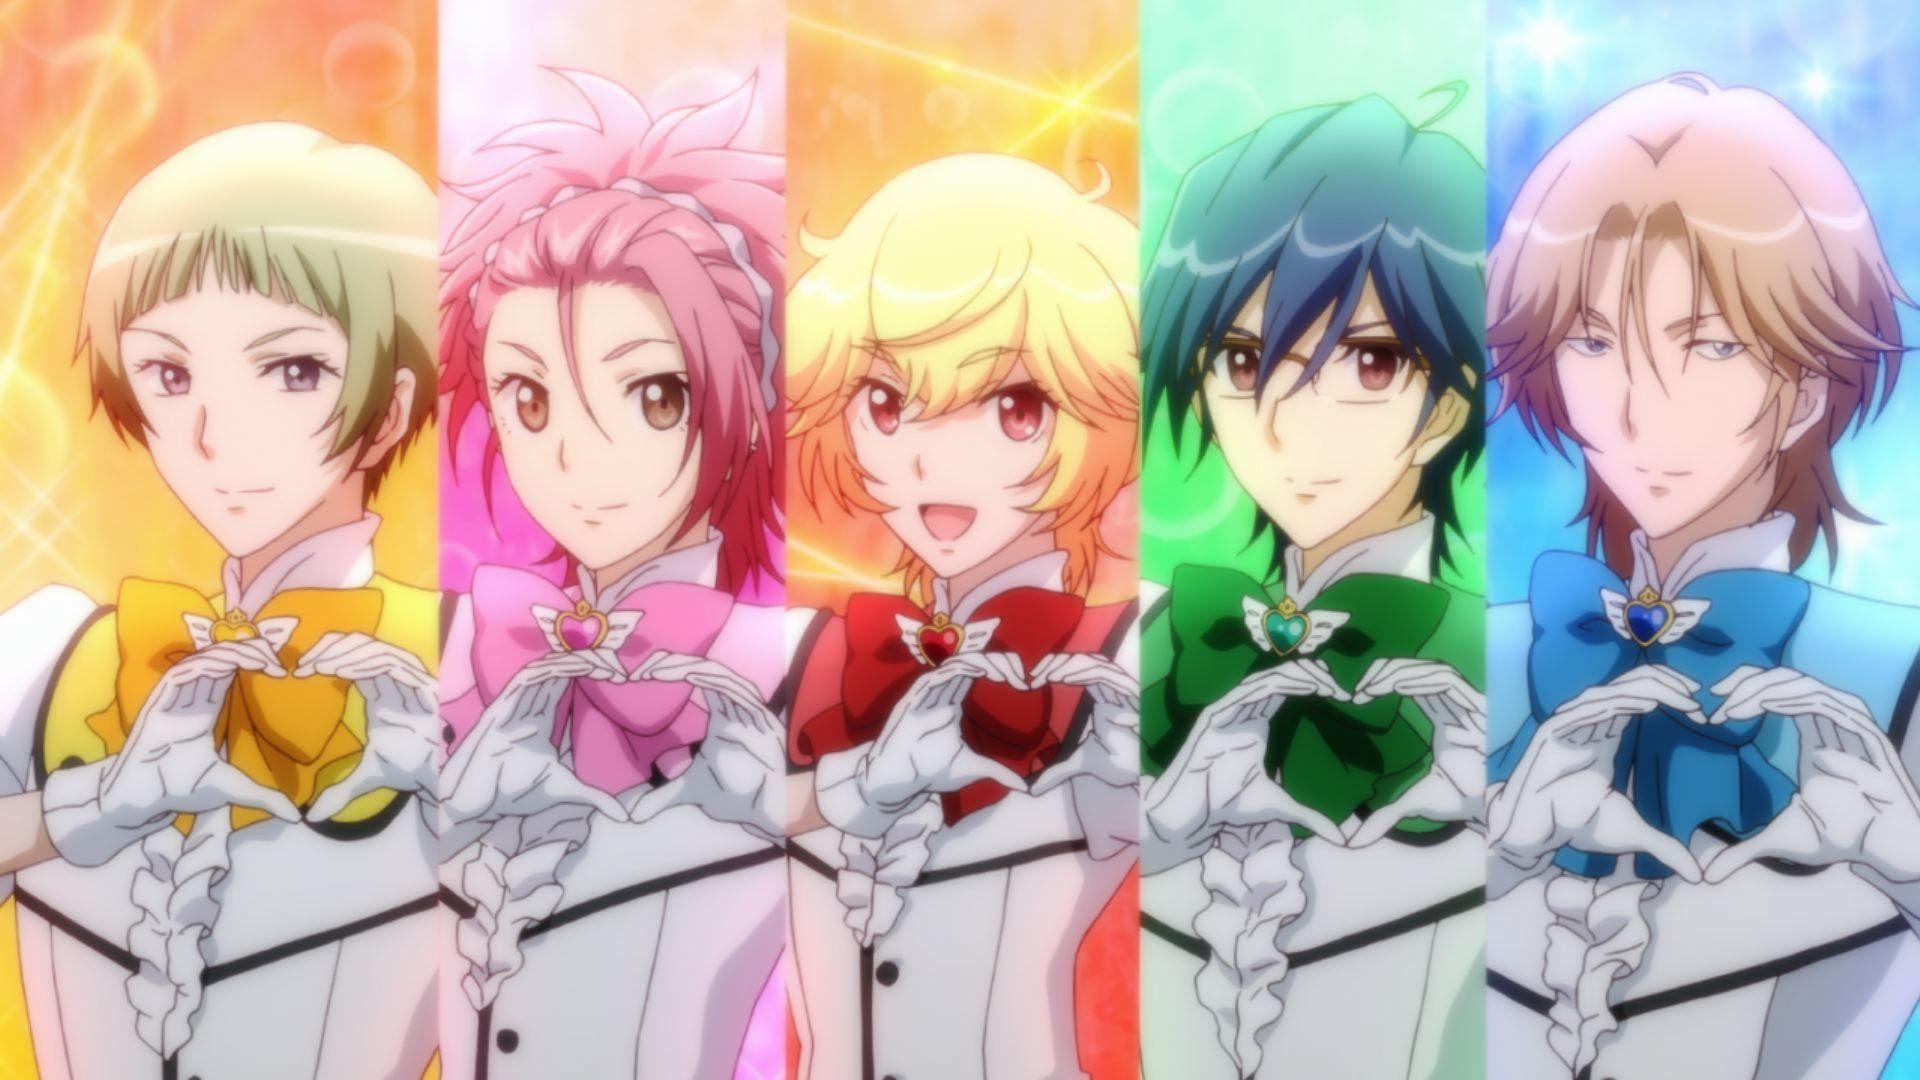 Binan Koukou Chikyuu Bouei Bu Love Magical Boy Anime Magical Girl Anime Anime